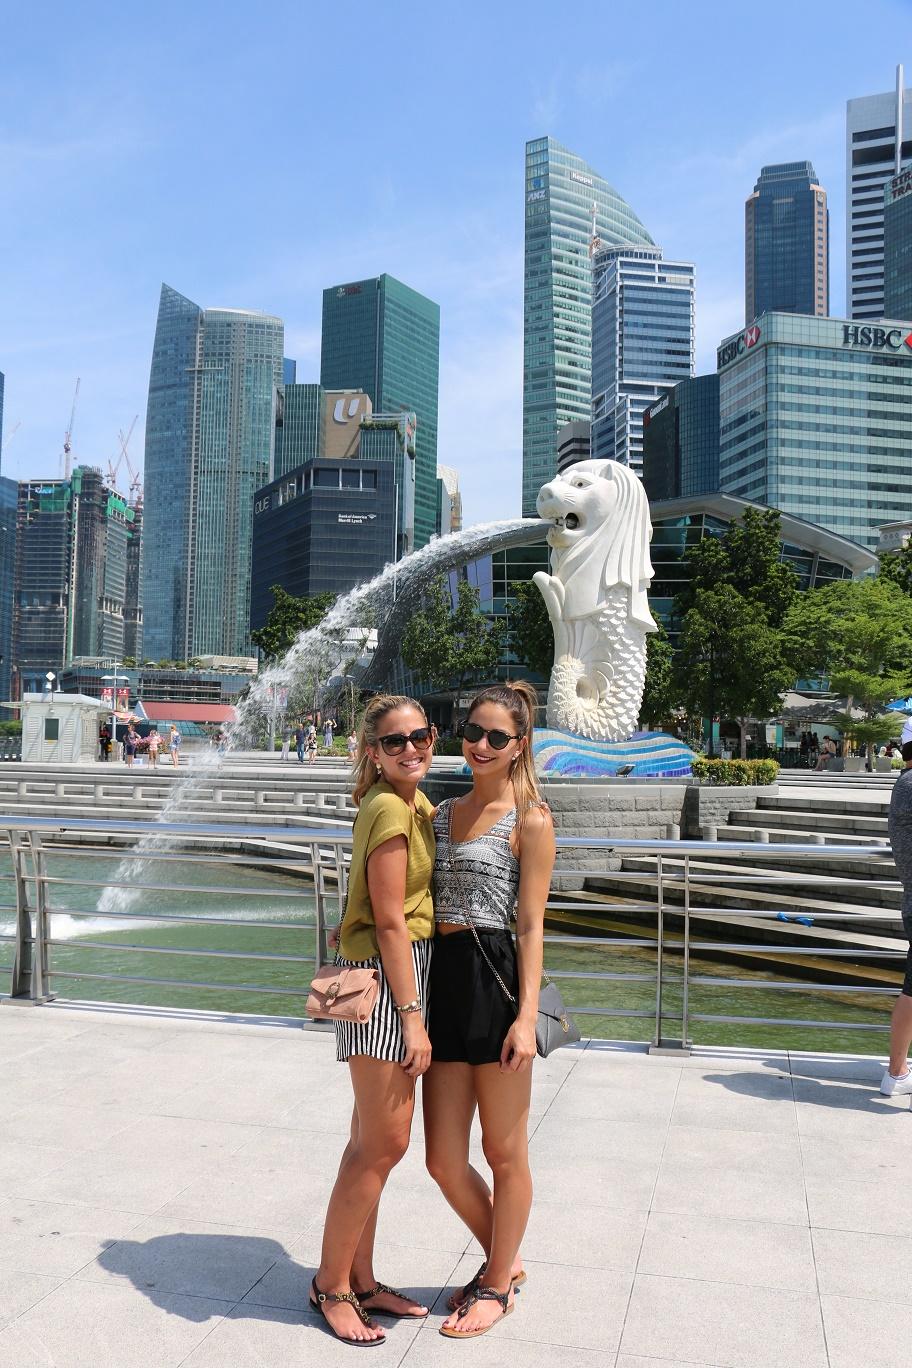 Singapur_Skyline_Merlion_4_thebraidedgirl